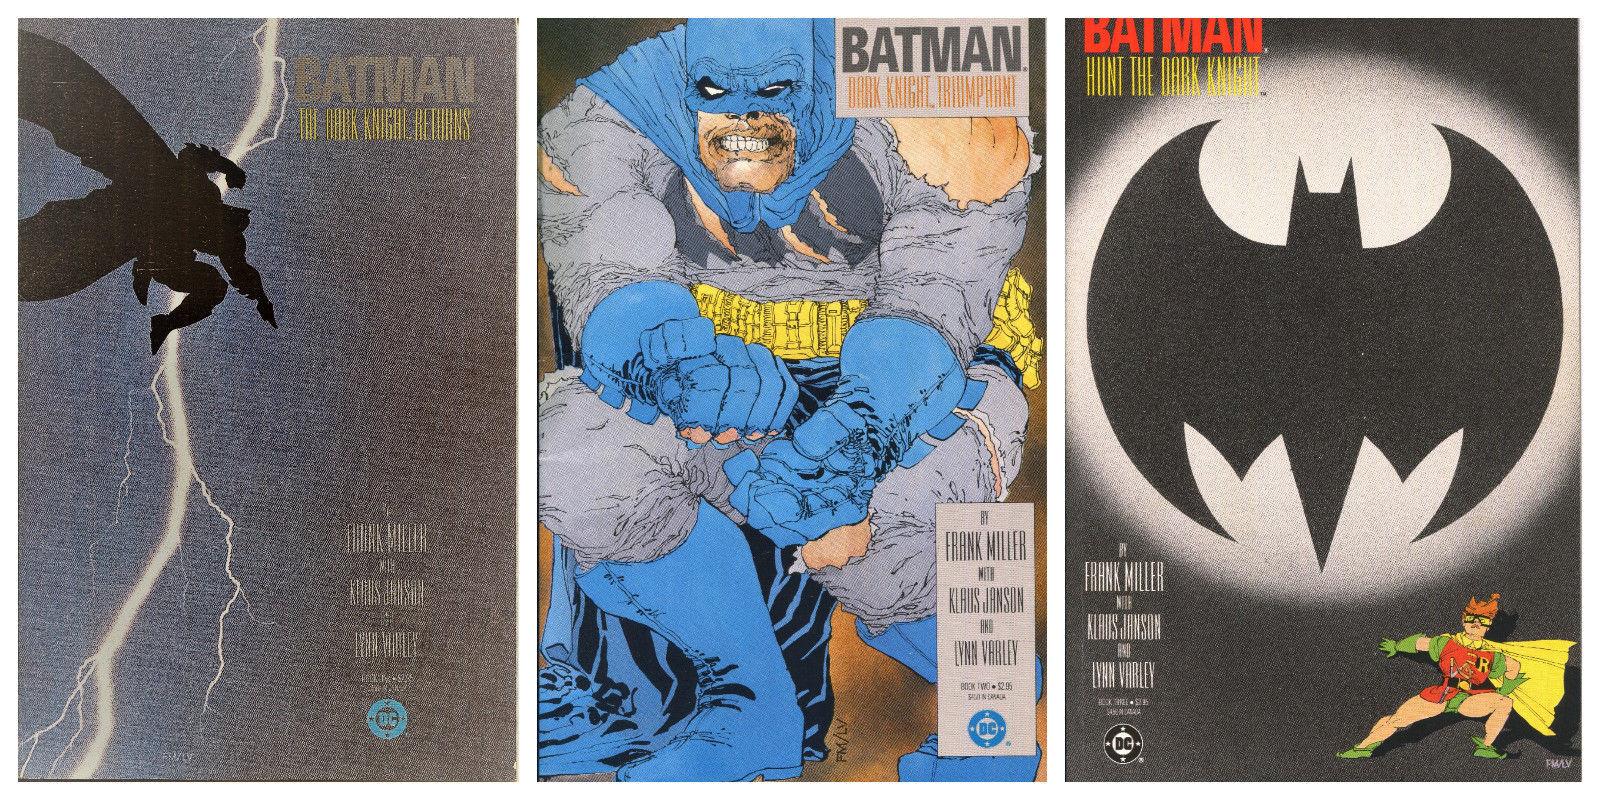 Batman The Dark Knight Returns #1-3 tpb lot, Frank Miller, Klaus Janson